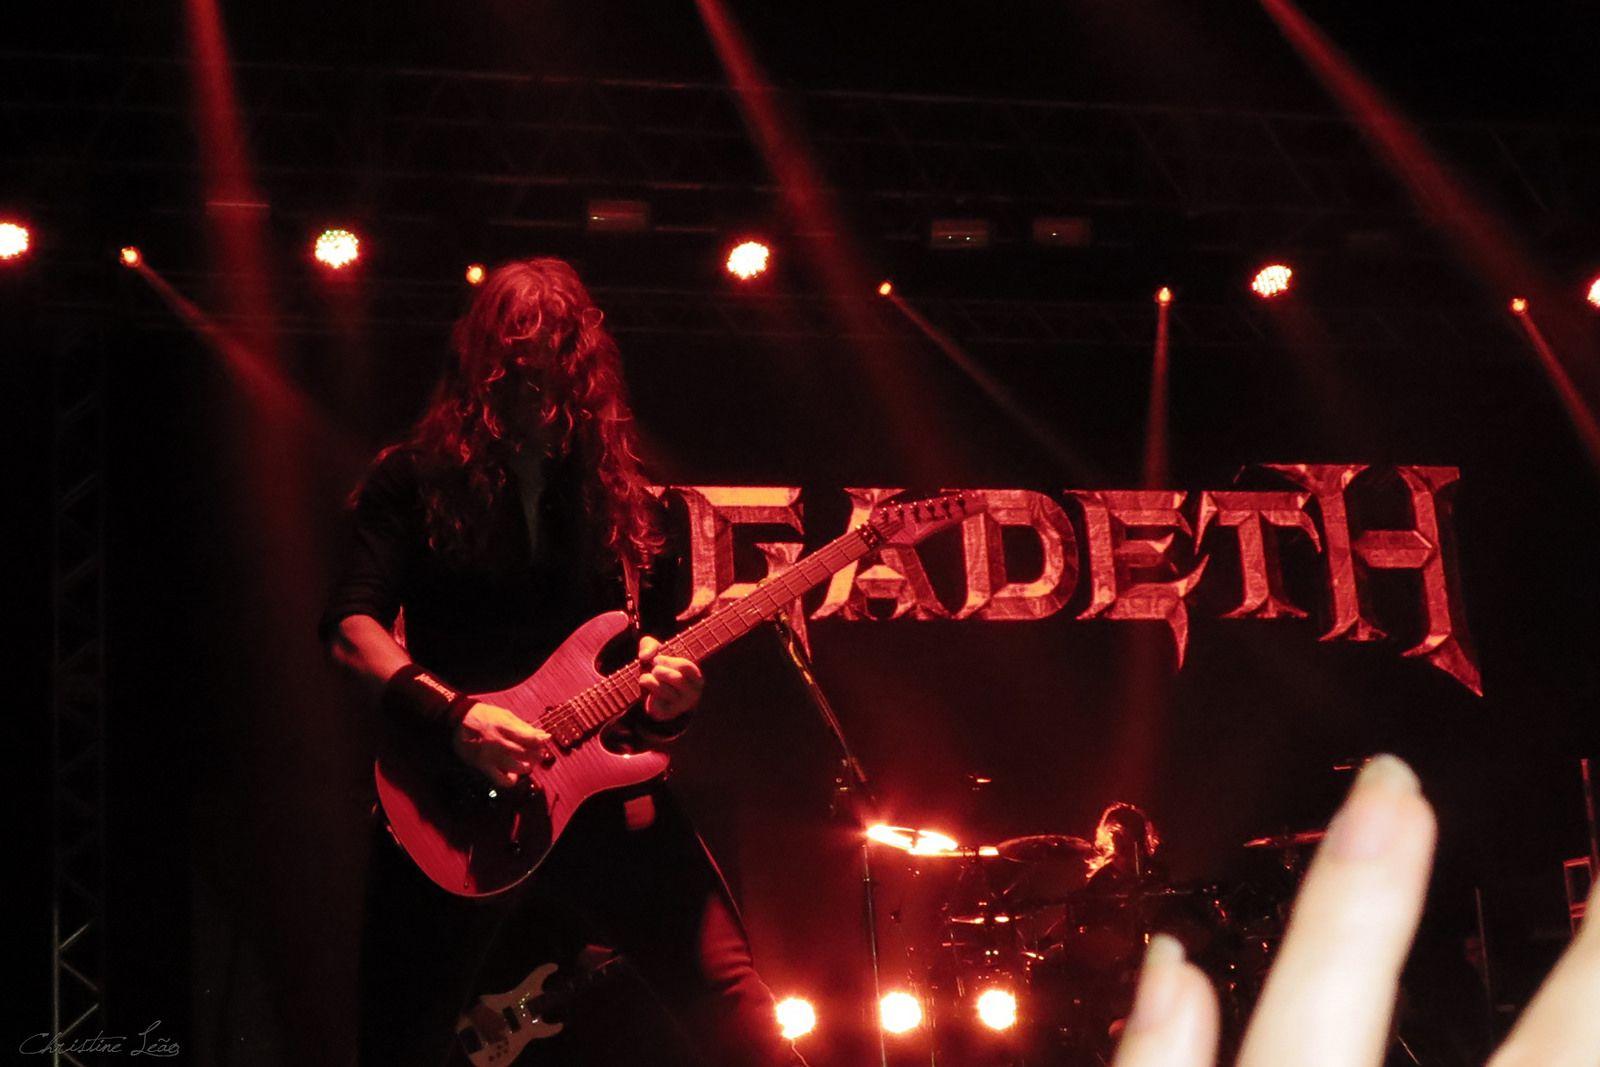 https://flic.kr/p/Ke2BLZ   Kiko Loureiro   Megadeth em Fortaleza 2016